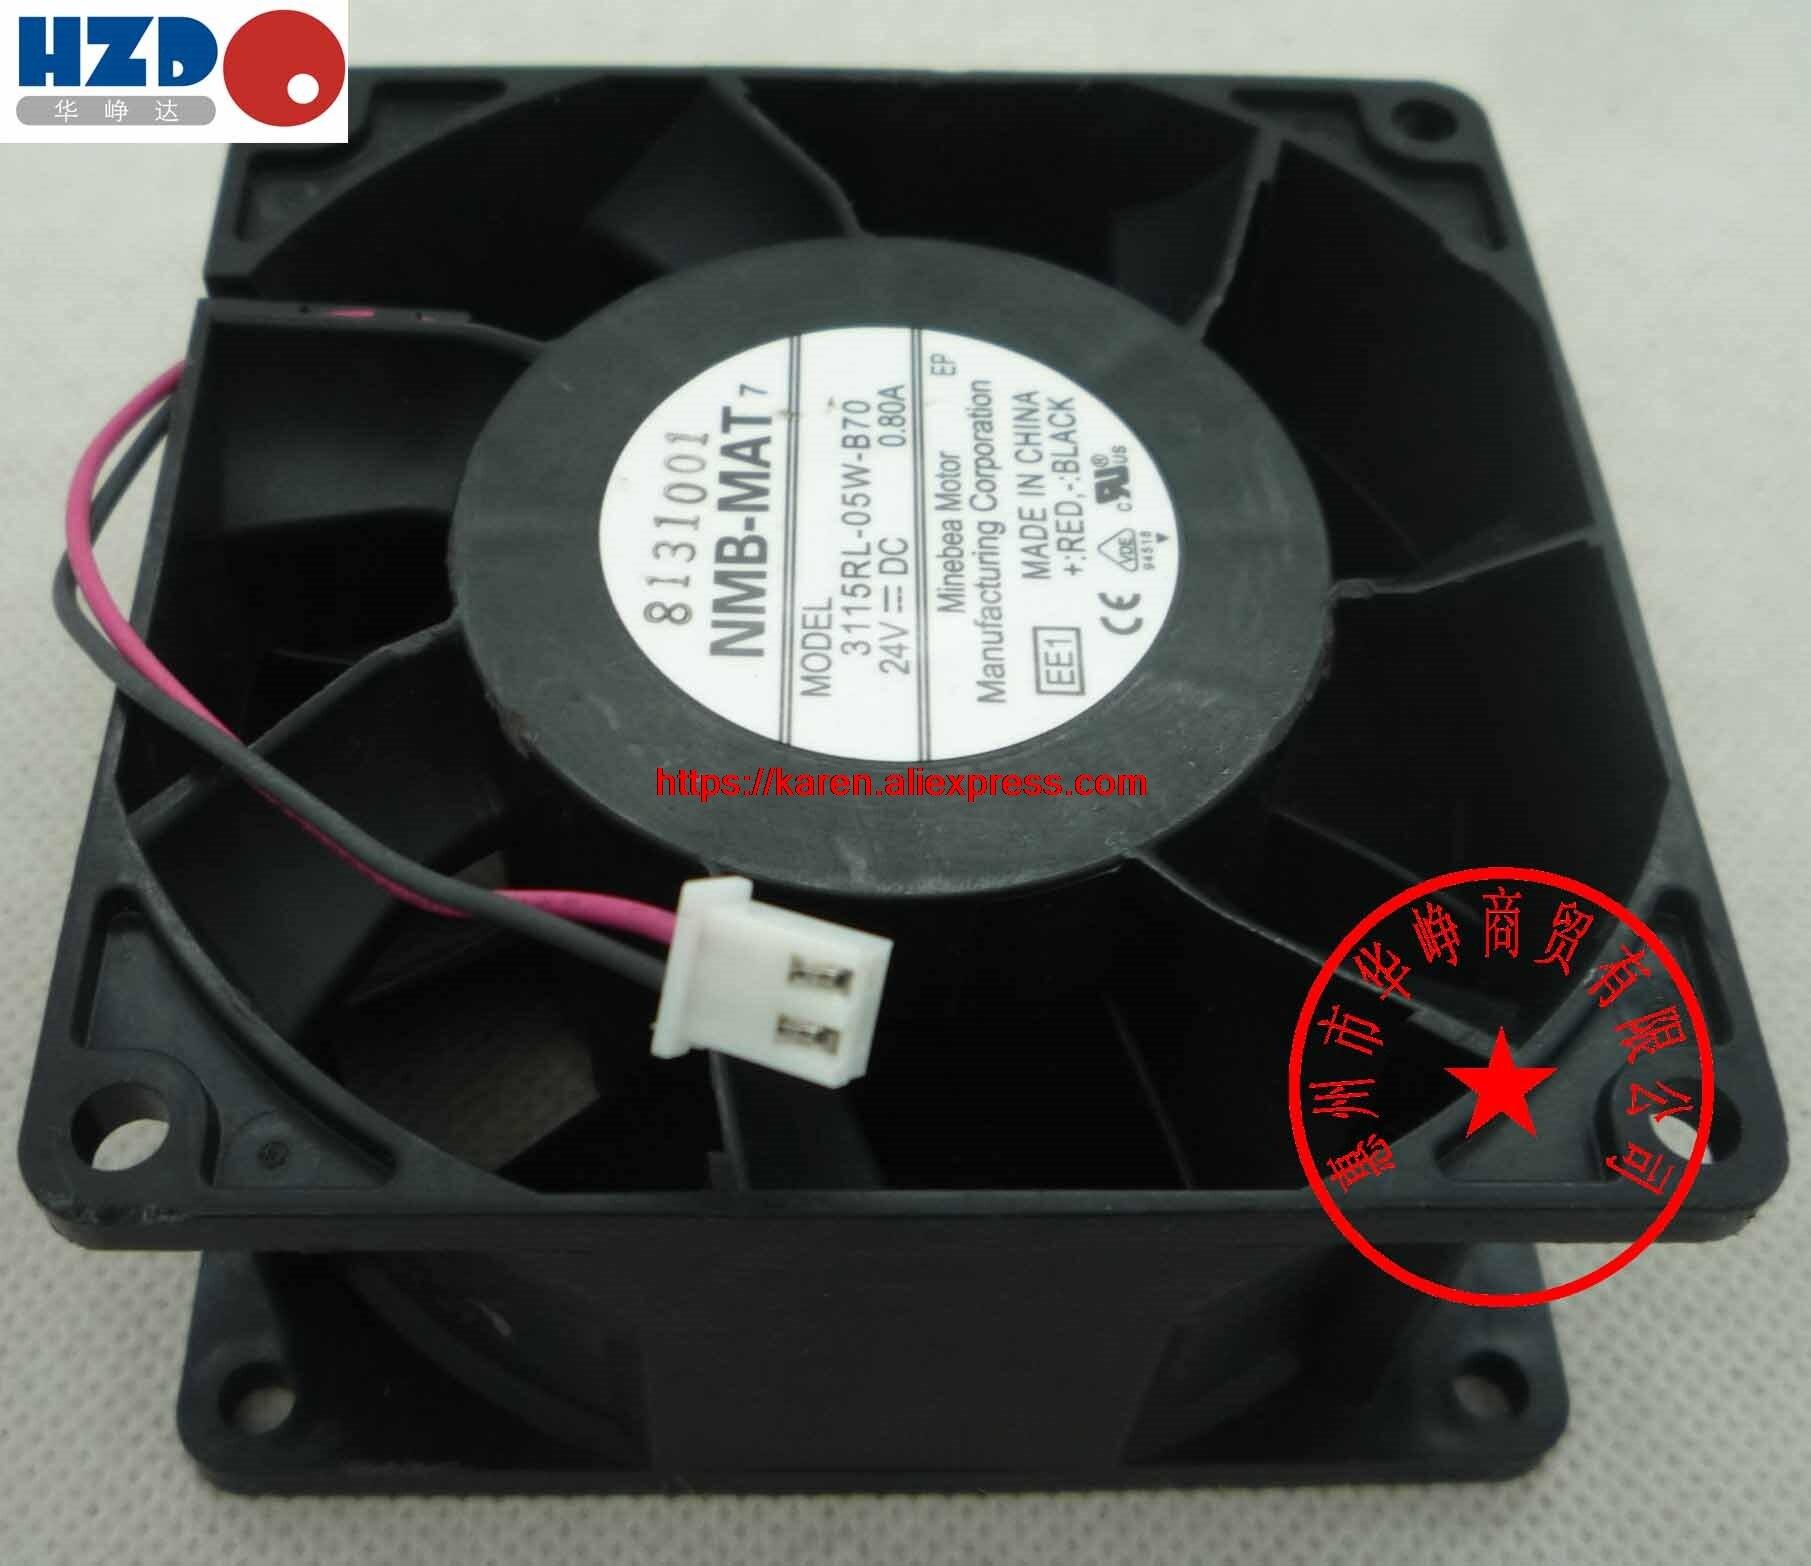 NMB 3115RL-05W-B70 0.8A 8cm 8038 24V 0.9A MGT8024YB-W38 Cooling fan<br>